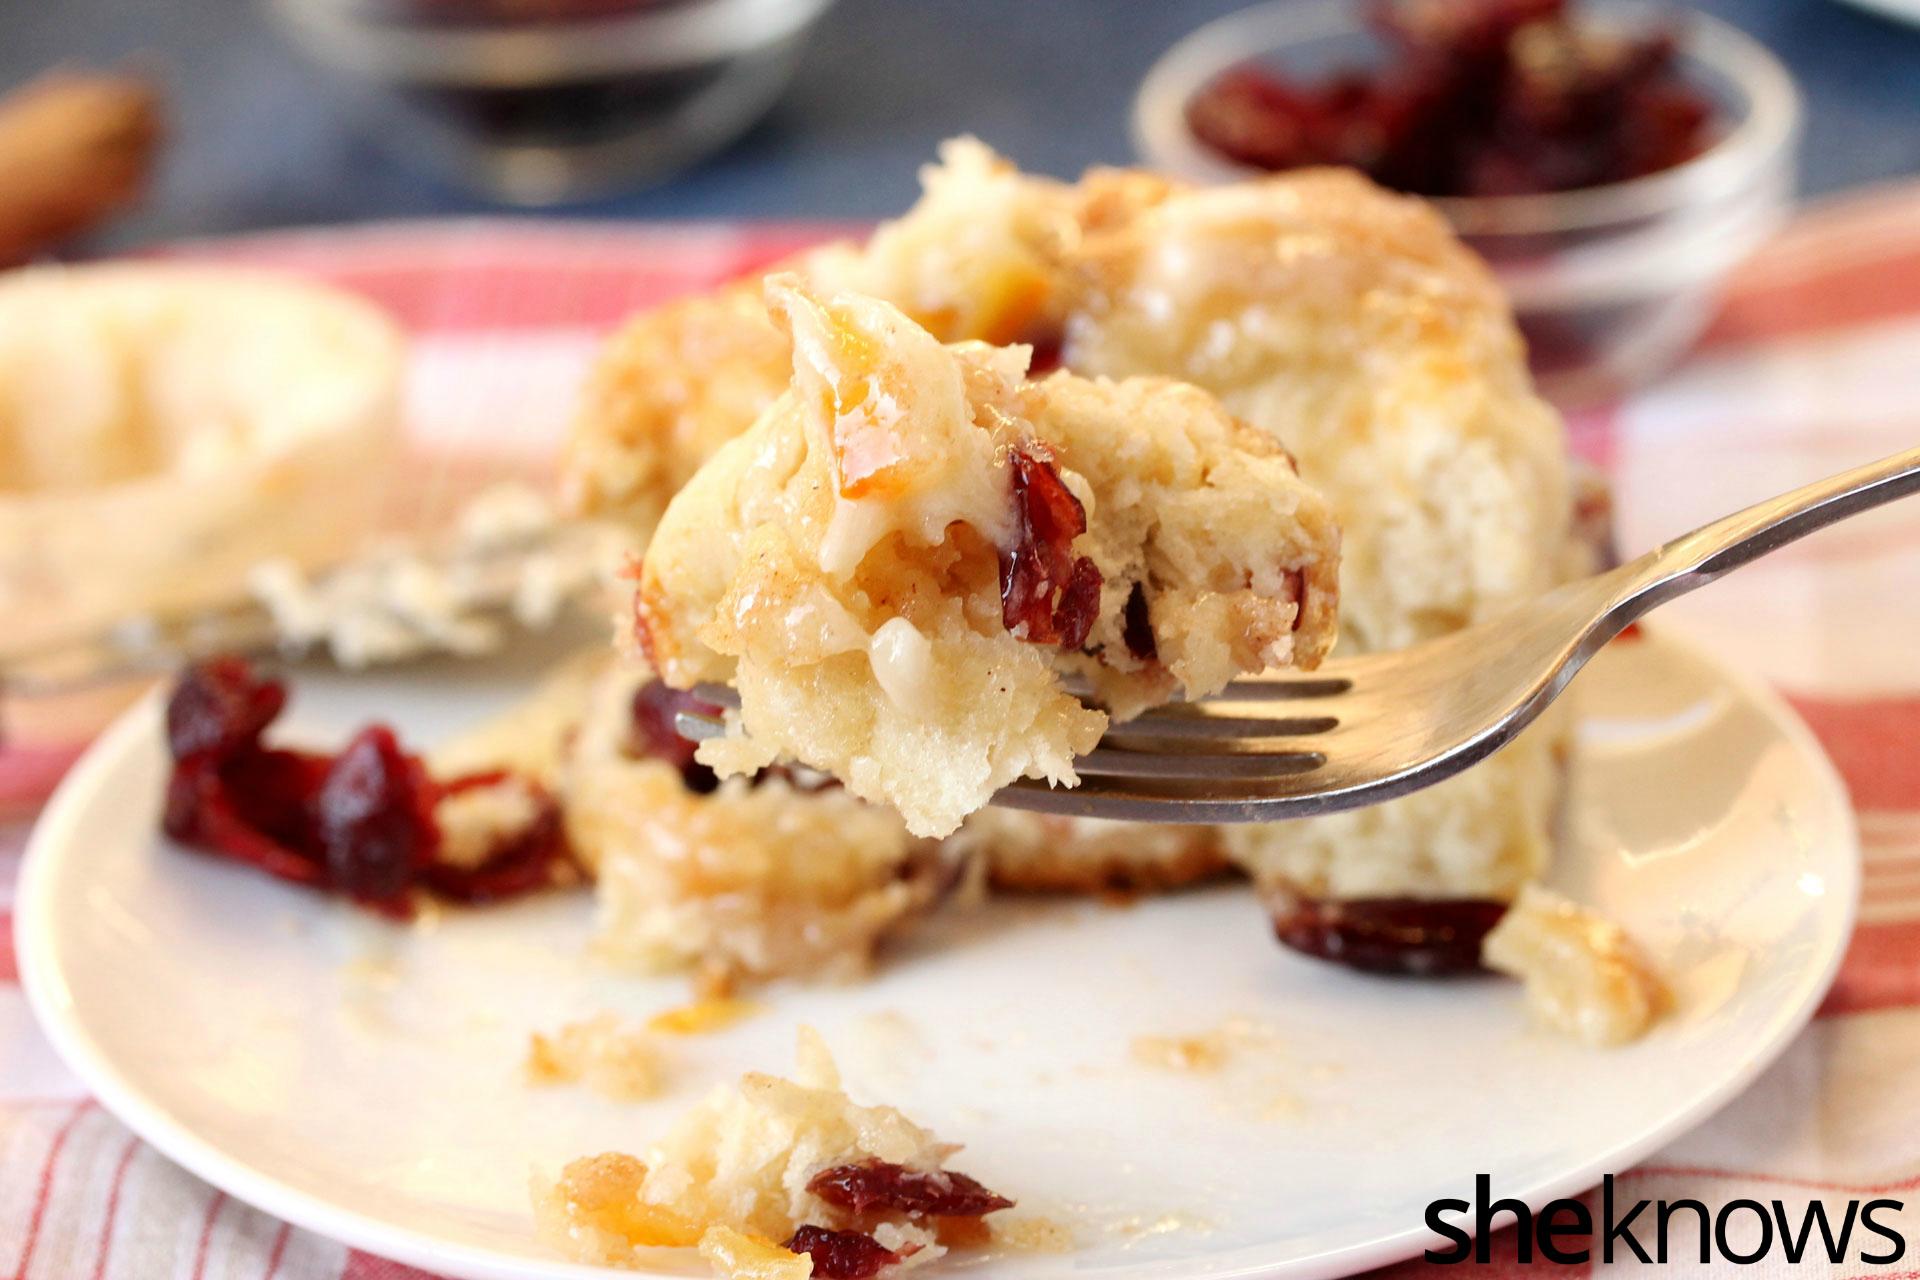 bite-of-cranberry-biscuit